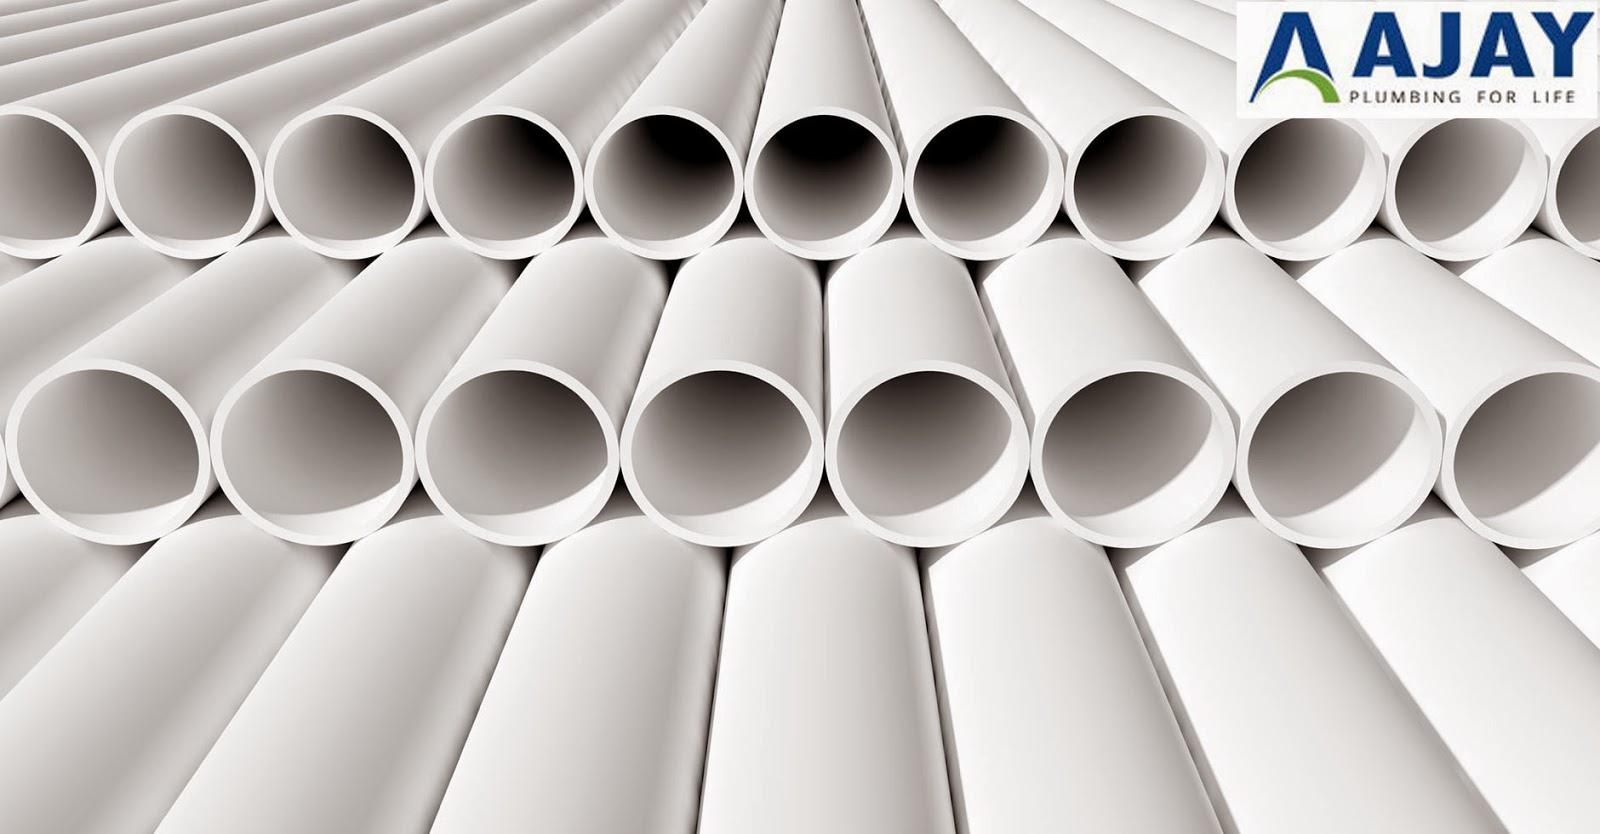 CPVC, PVC & UPVC Plastic Pipes & Fittings In India: Choose